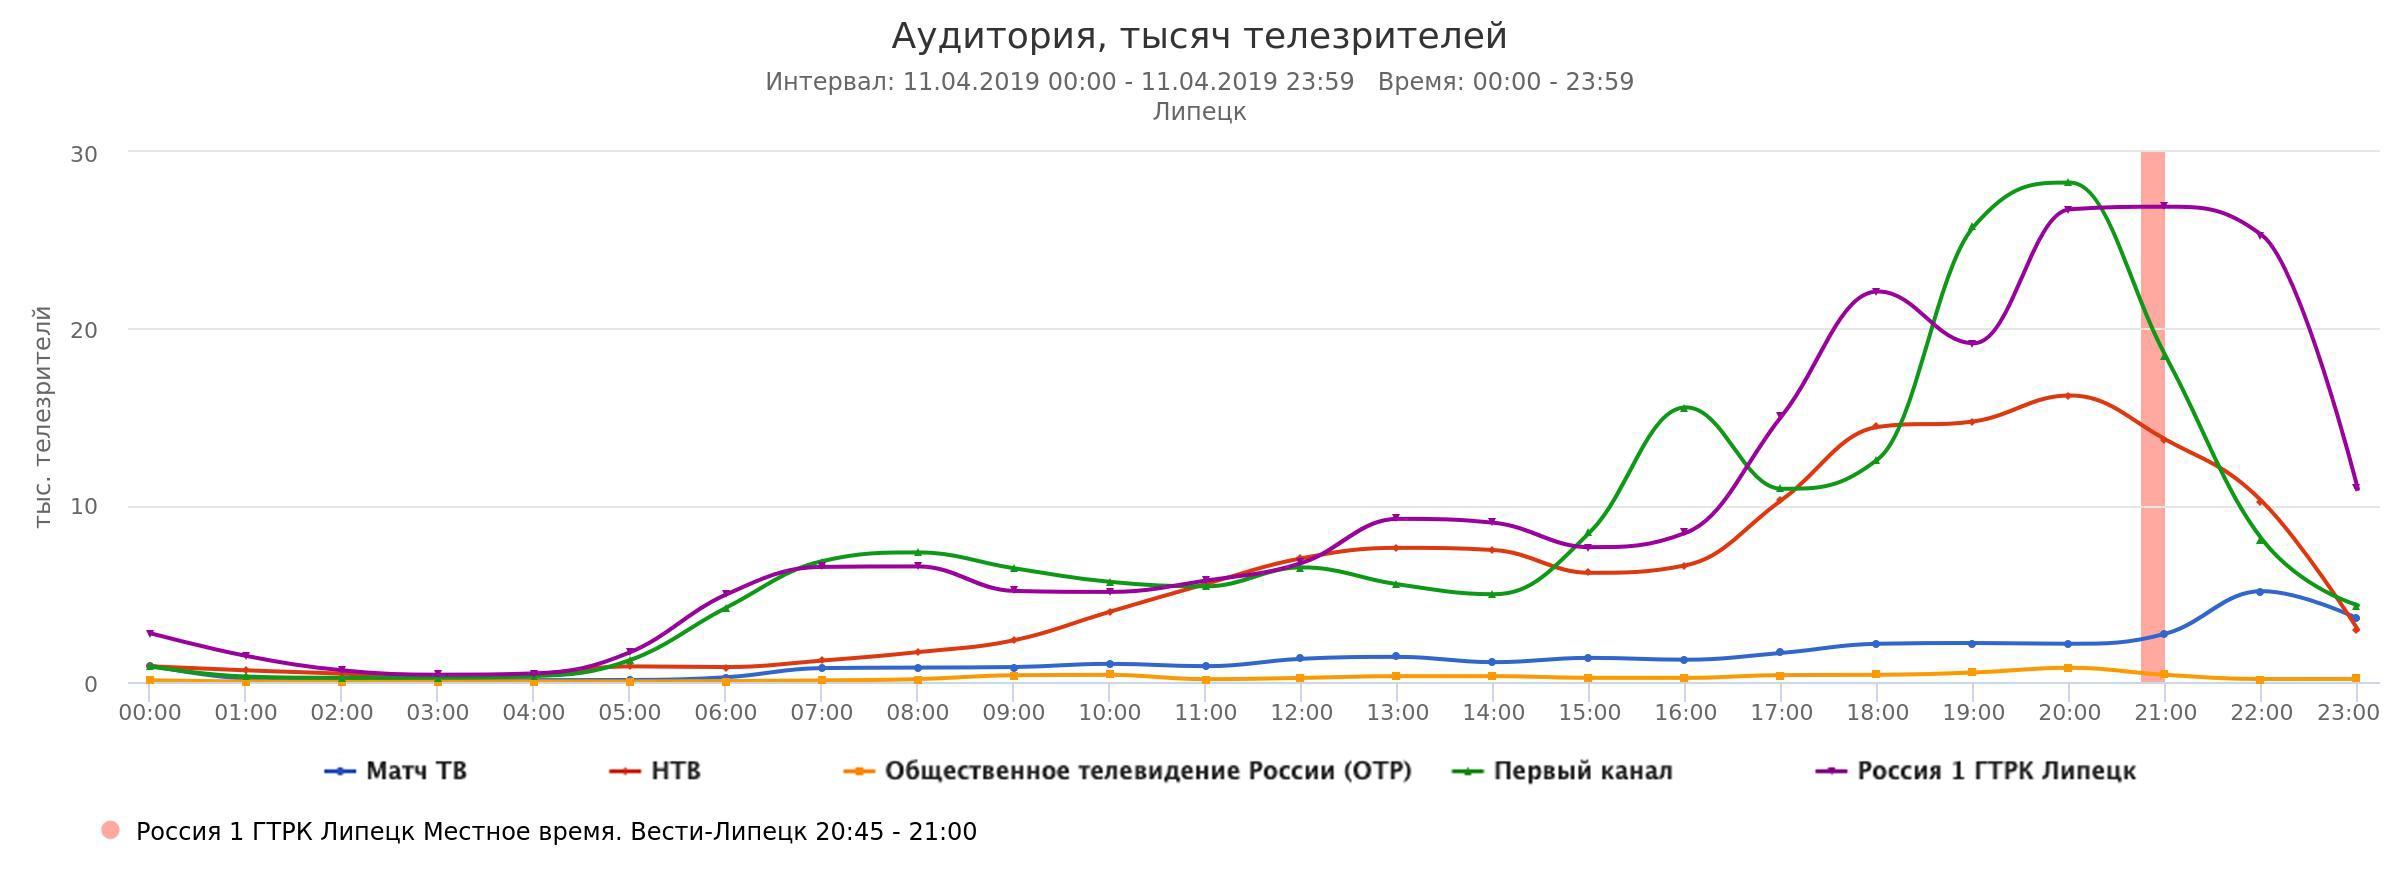 «Россия 1» снова лидер телепроката в Липецкой области — Изображение 3